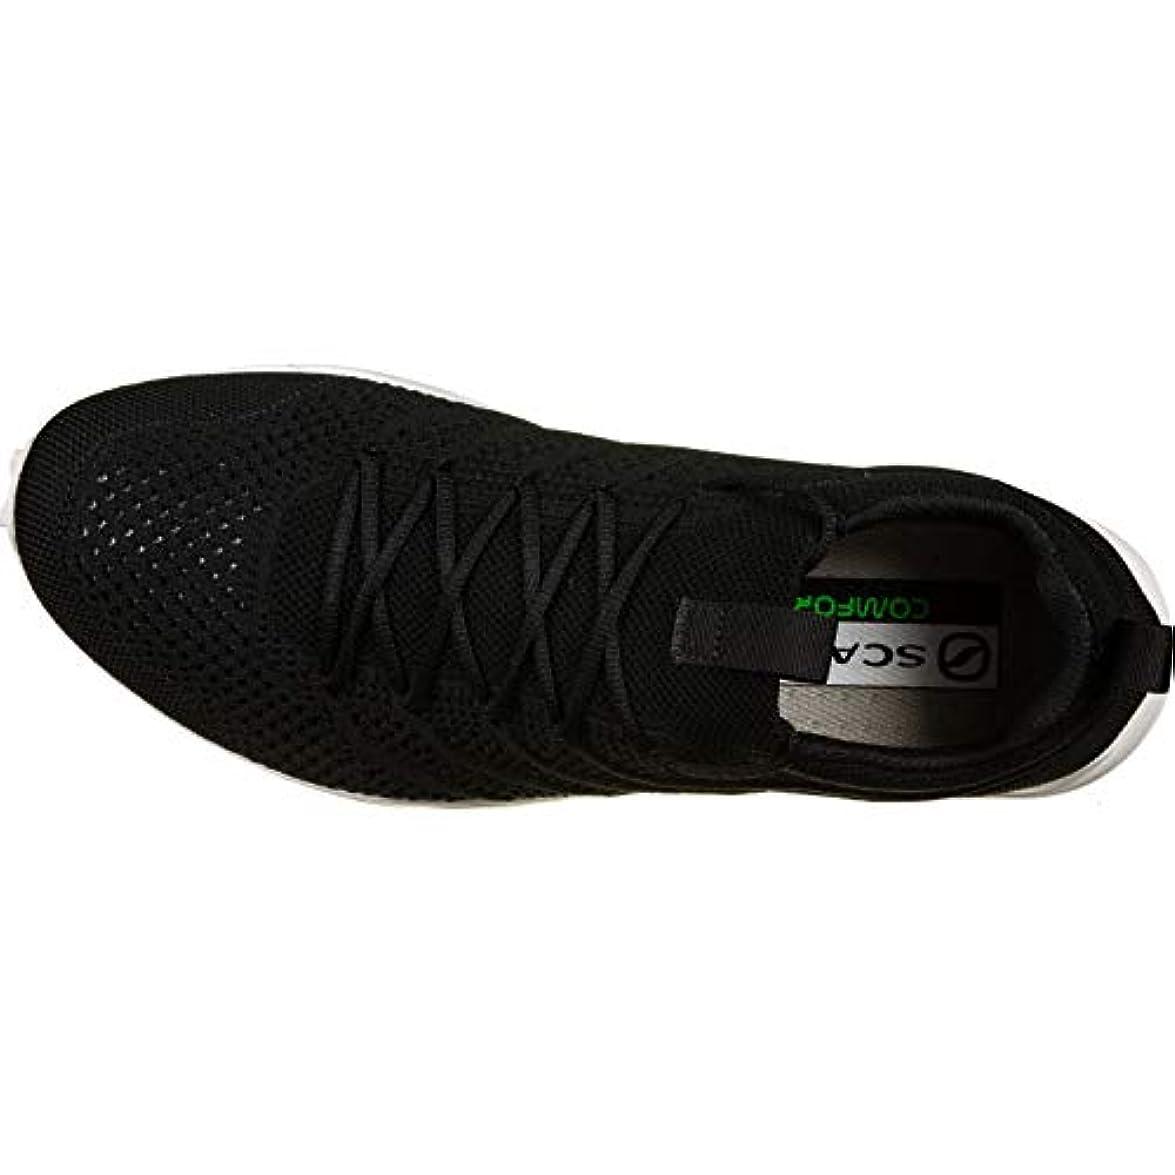 Scarpa-farbe black Scarpa-groesse 45 5